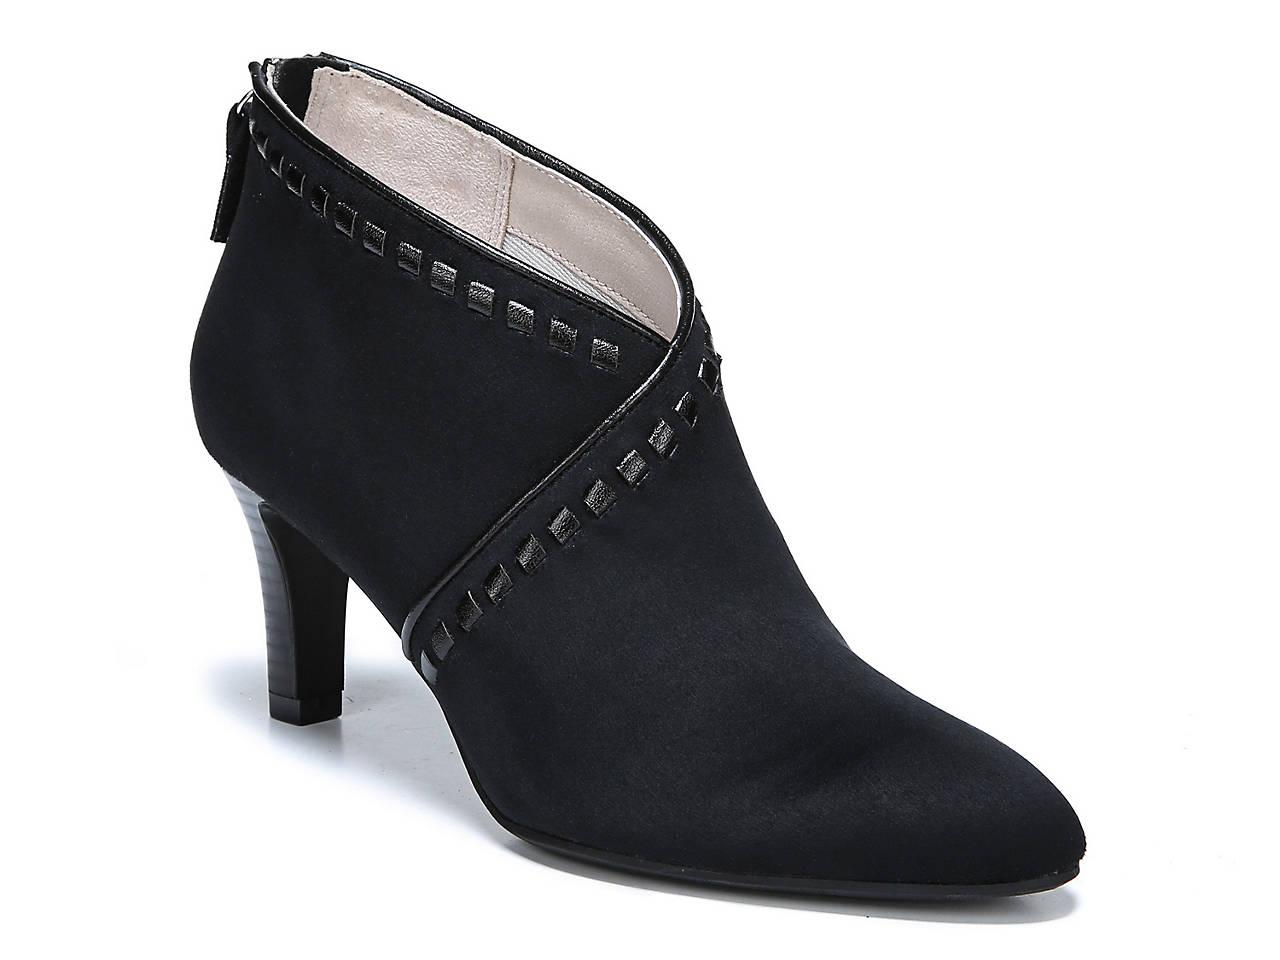 d3f6ebc8b12538 LifeStride Giada Bootie Women s Shoes